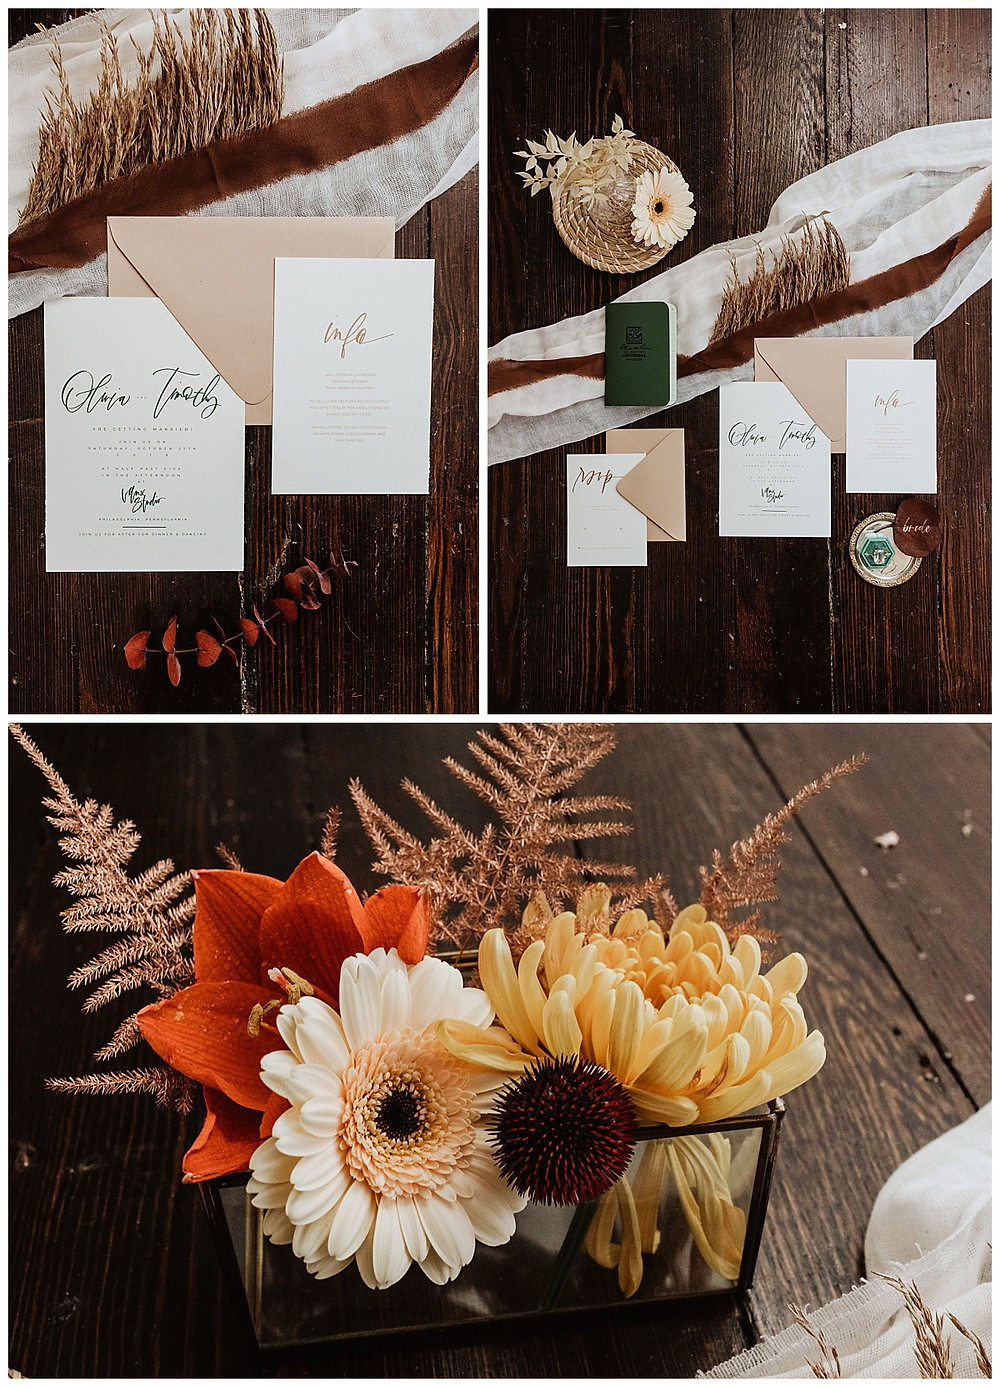 Boho Rustic Wedding Stationary Details